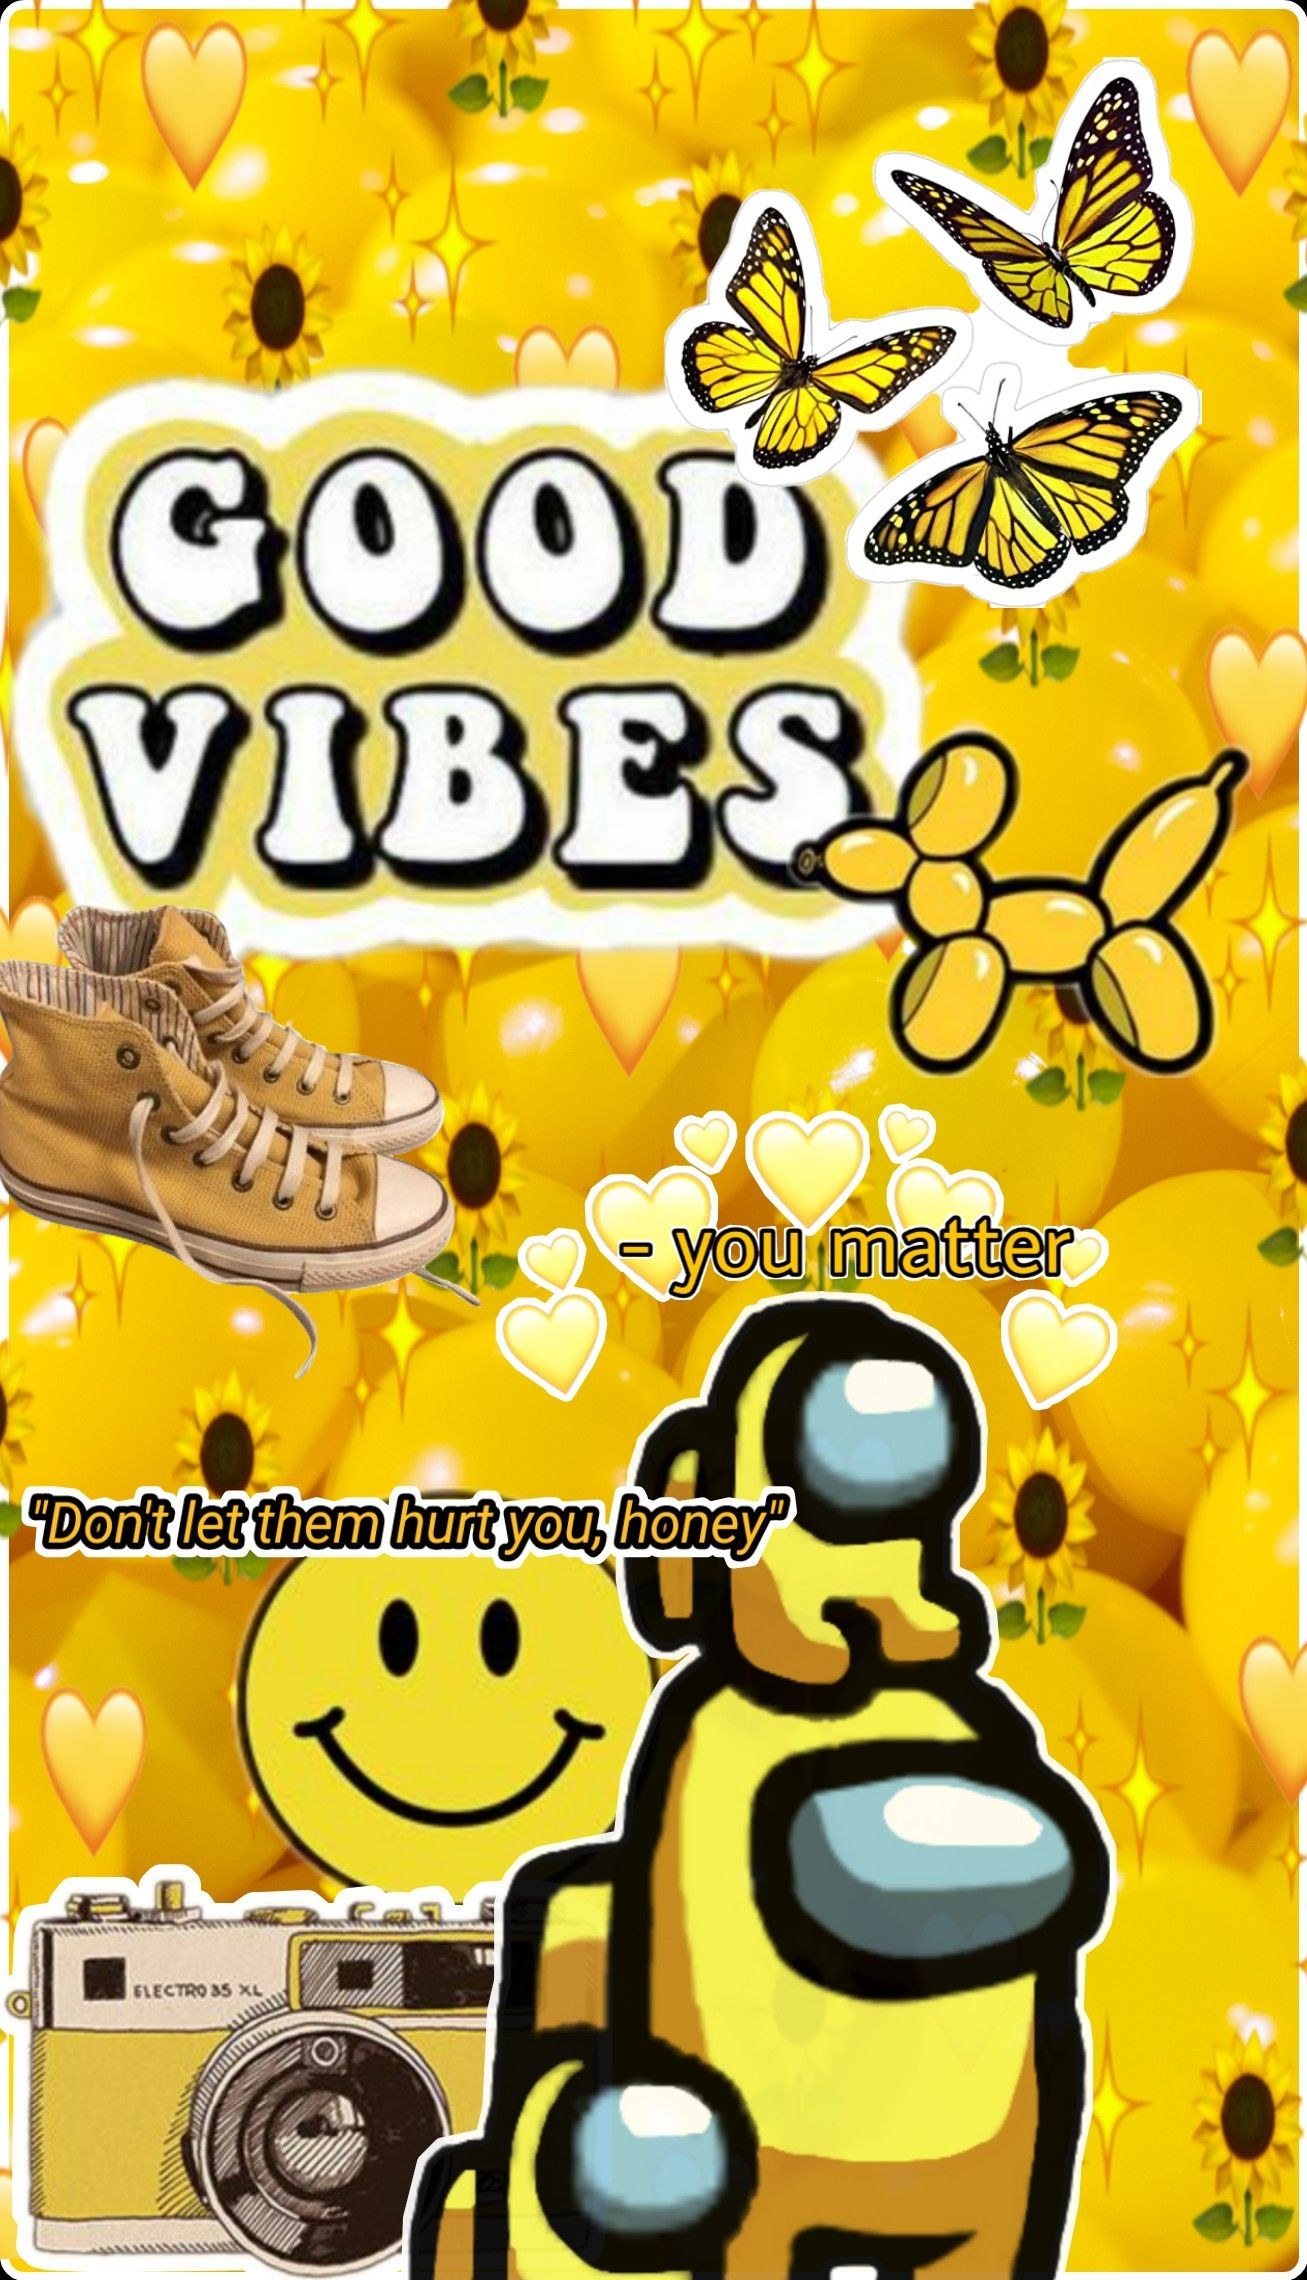 Good Vibes Yellow Wallpaper Wallpaper Yellow Wallpaper Character